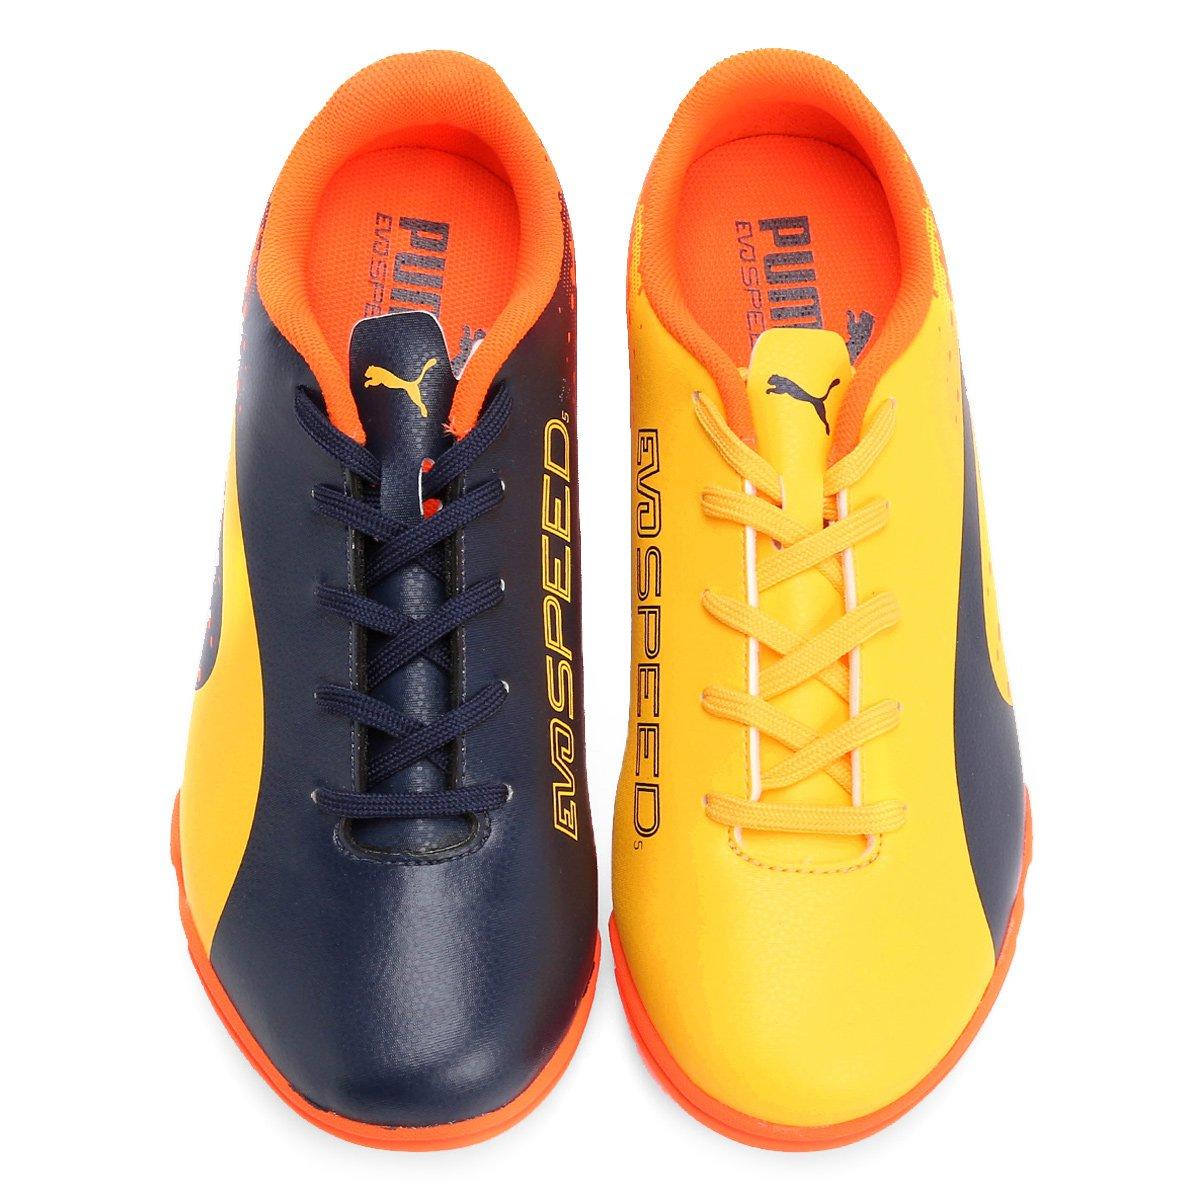 98207a54784a2 Chuteira Futsal Infantil Puma Evospeed 17.5 Tricks IT - Compre Agora ...